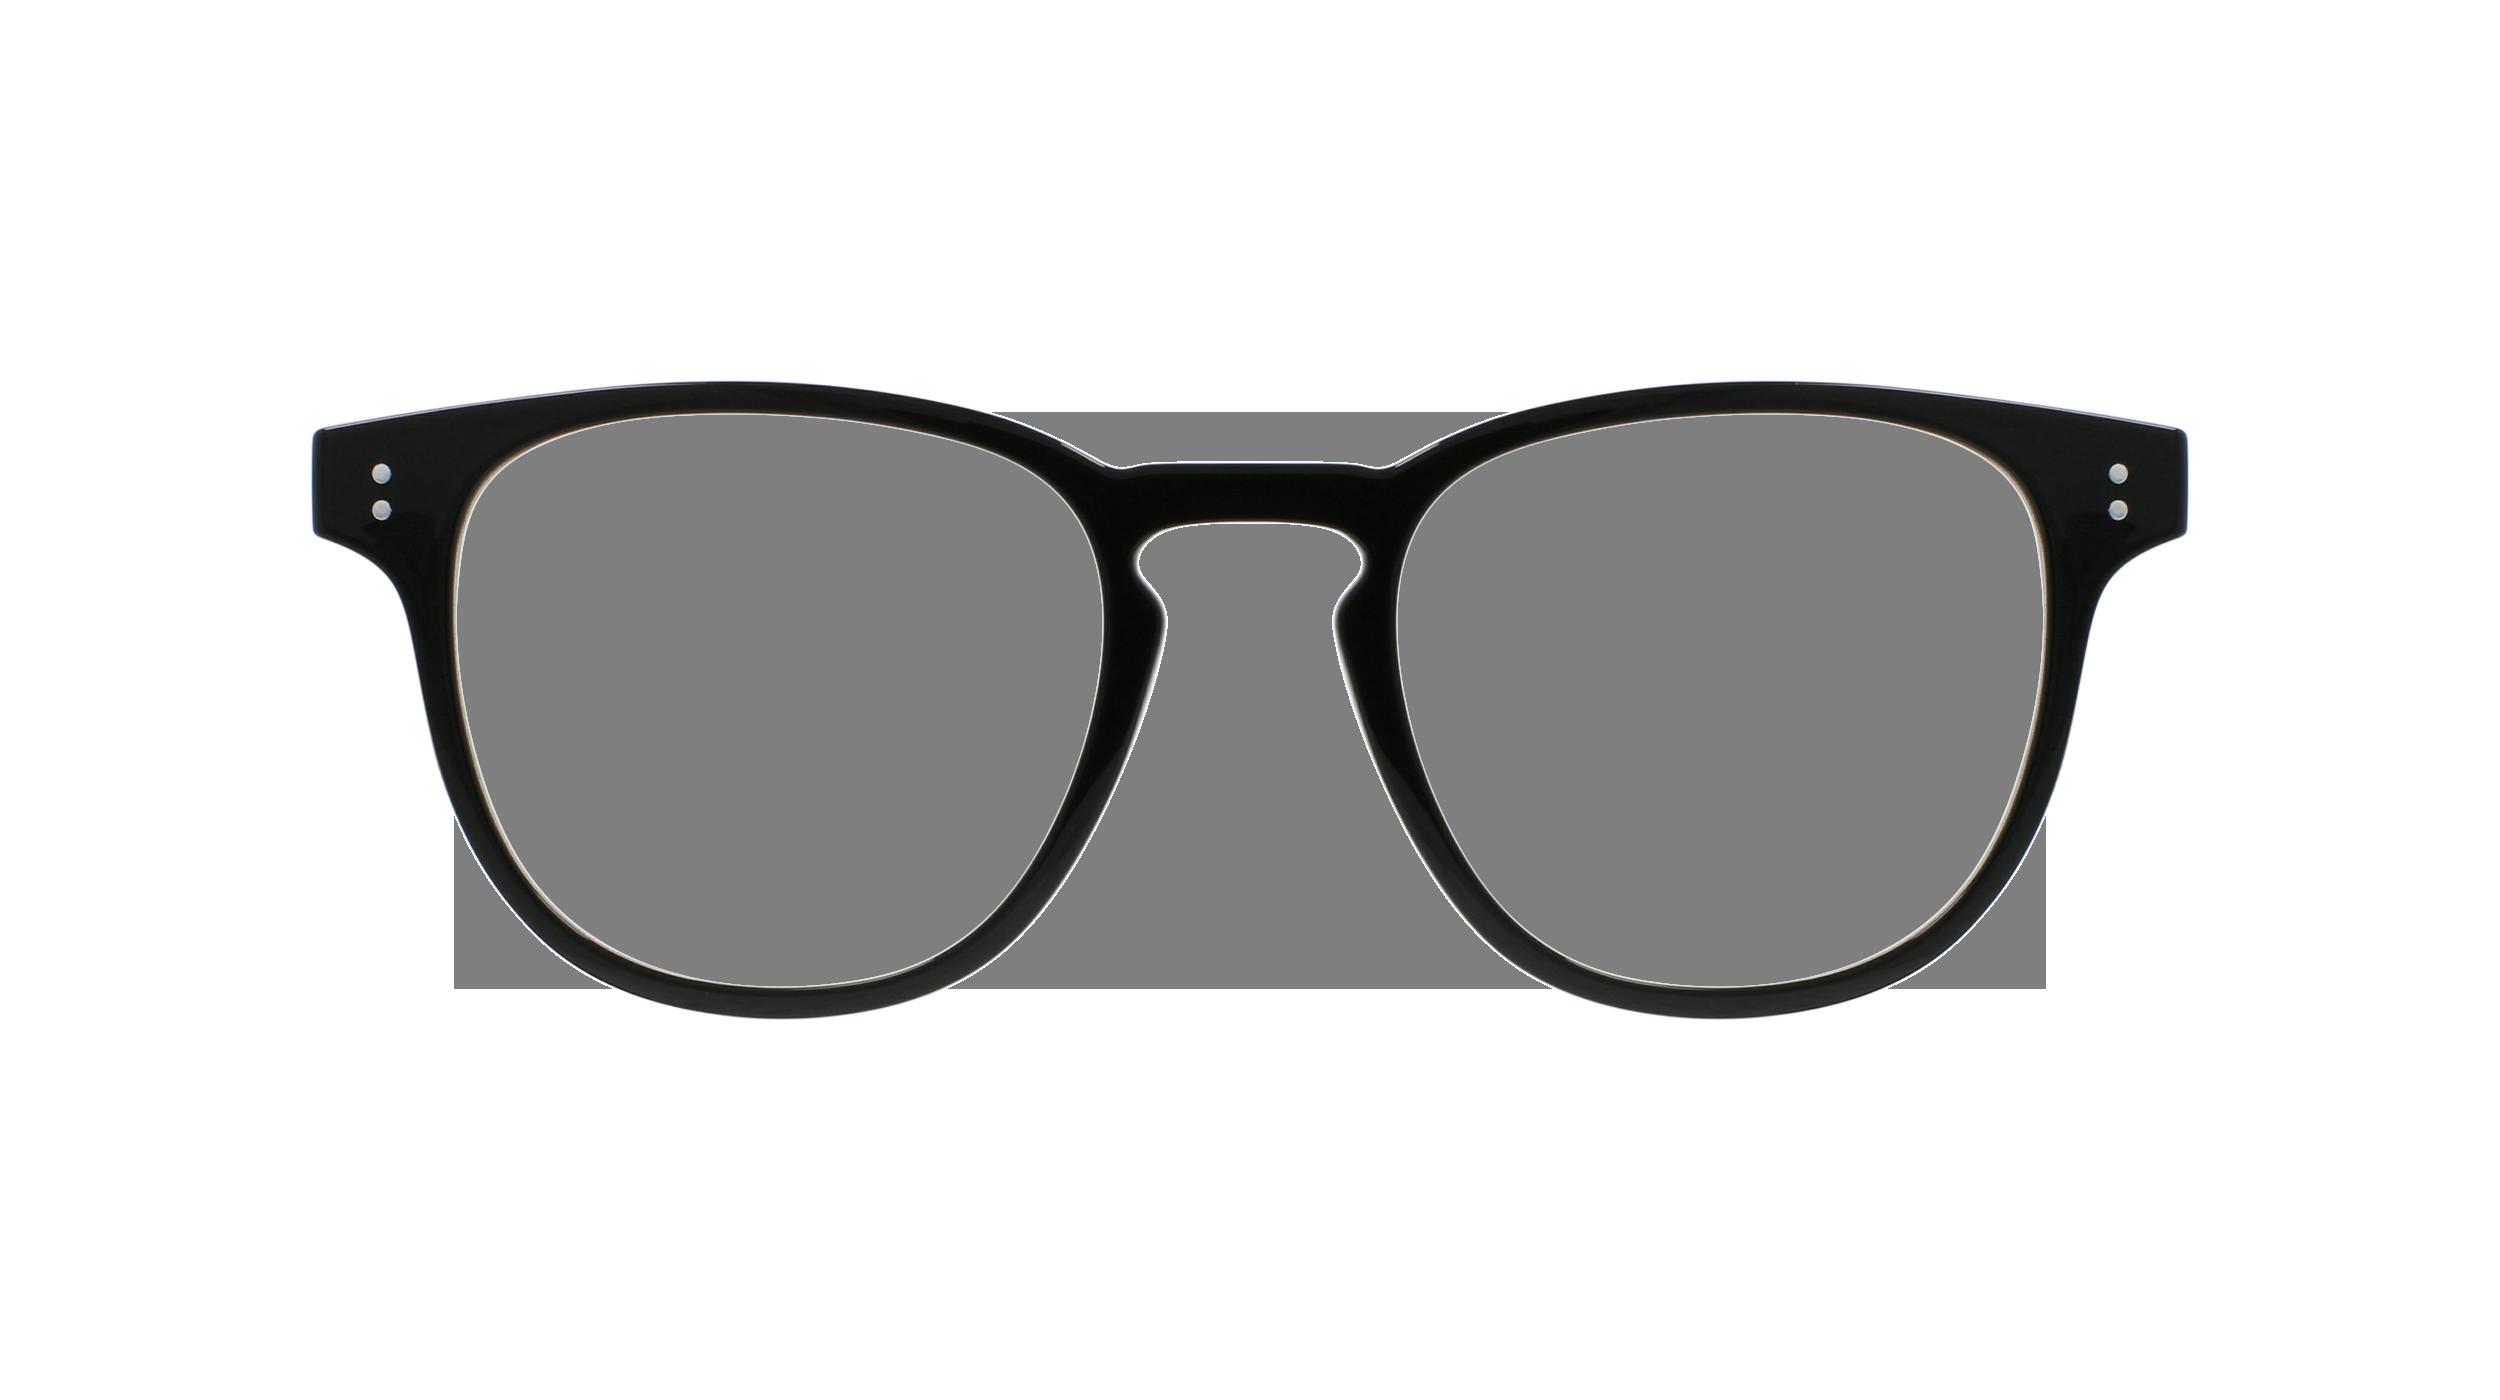 afflelou/france/products/smart_clip/clips_glasses/07630036452615.png